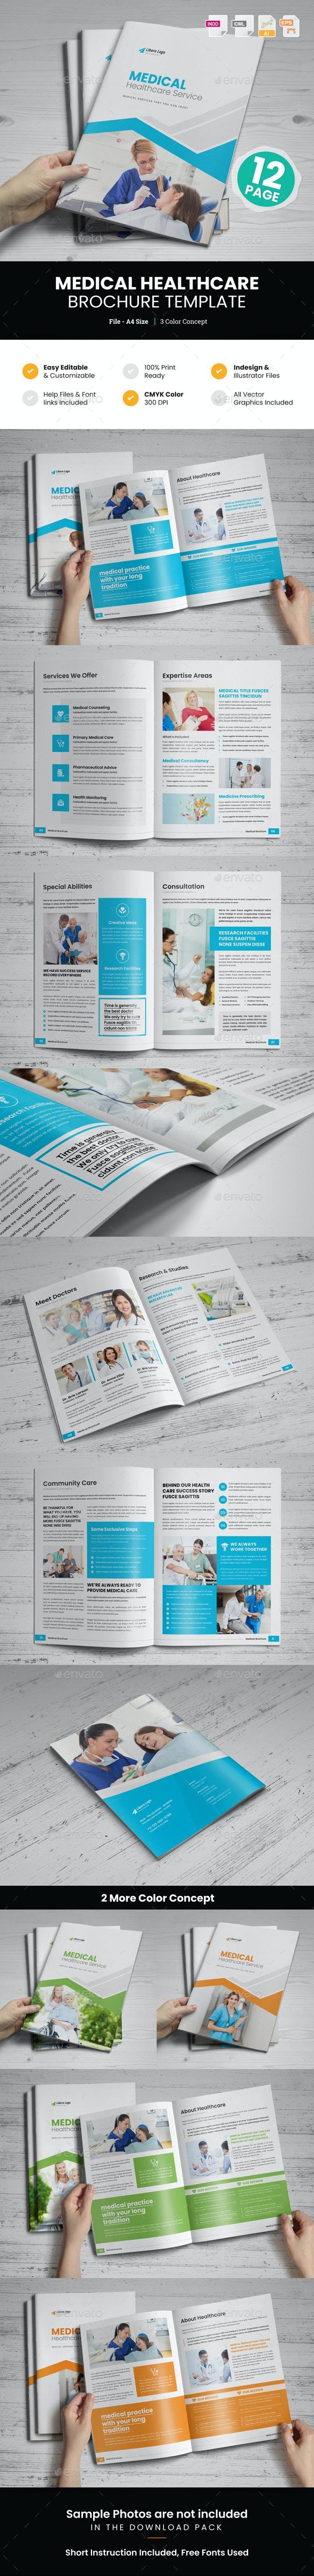 Medical HealthCare Brochure v4 - Corporate Brochures